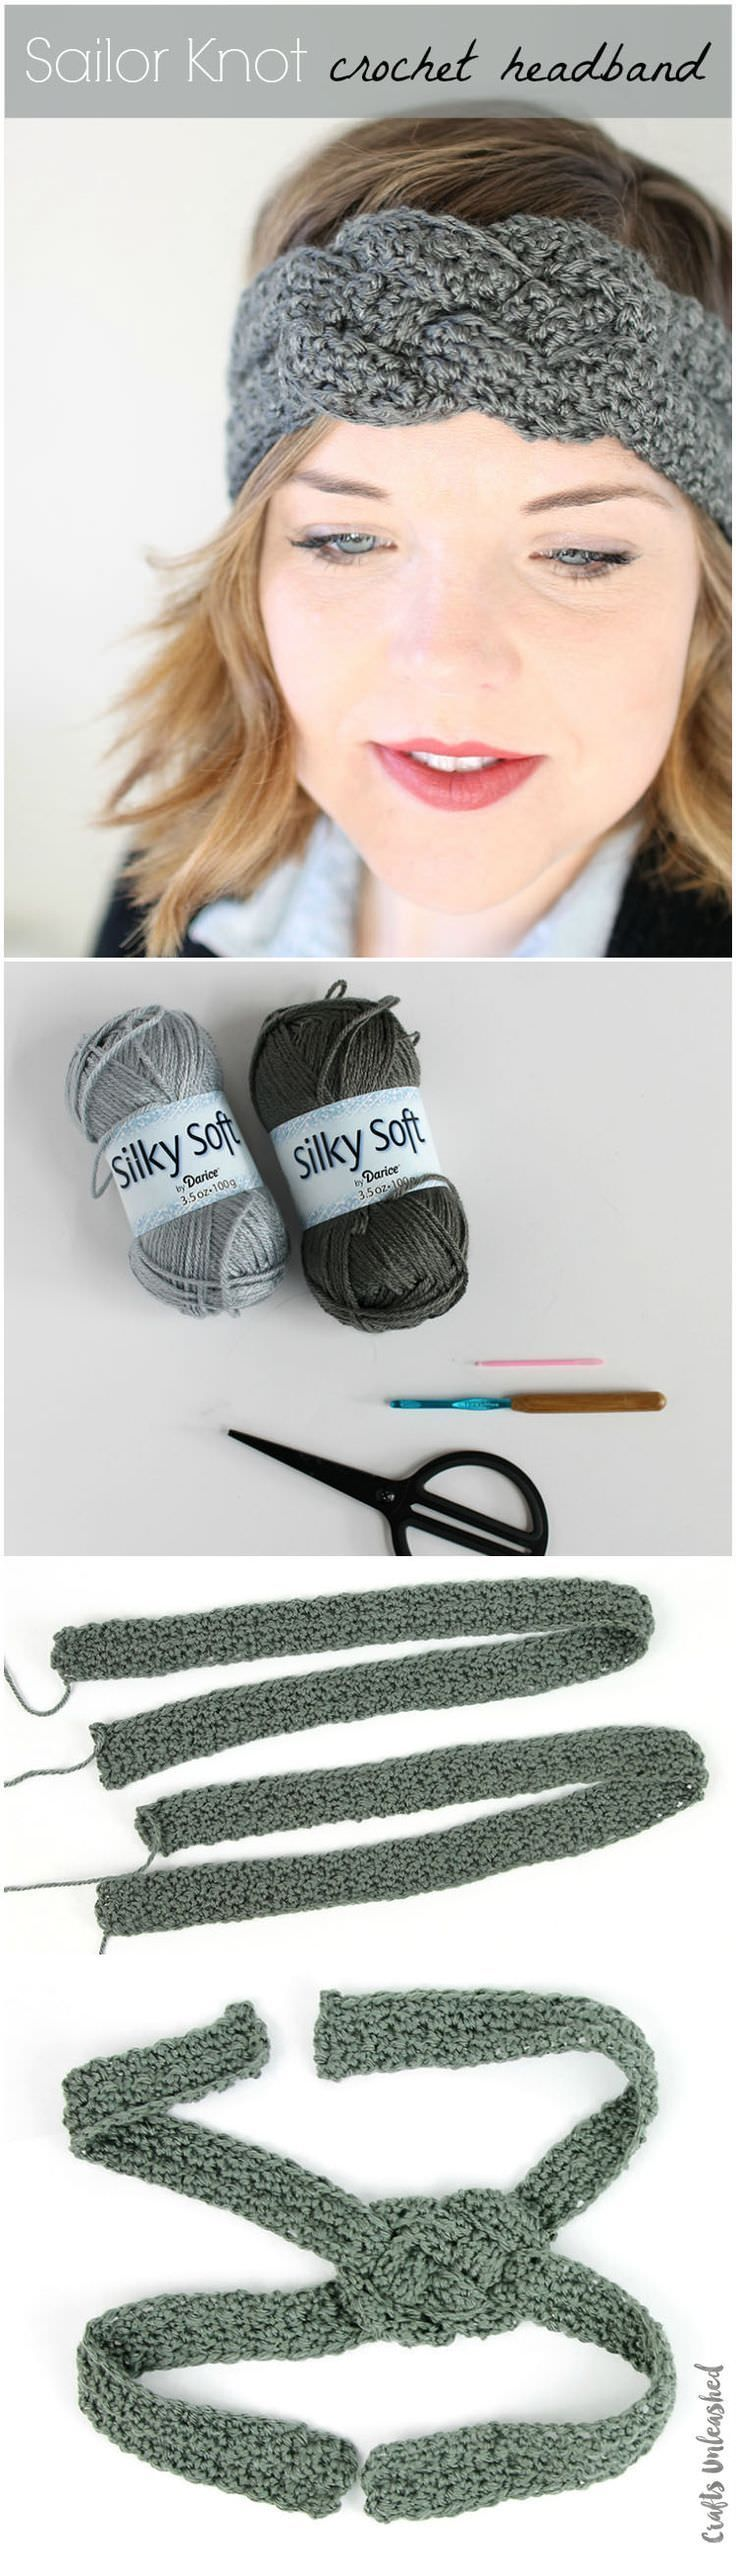 Sailor Knot Crochet Headband Pattern